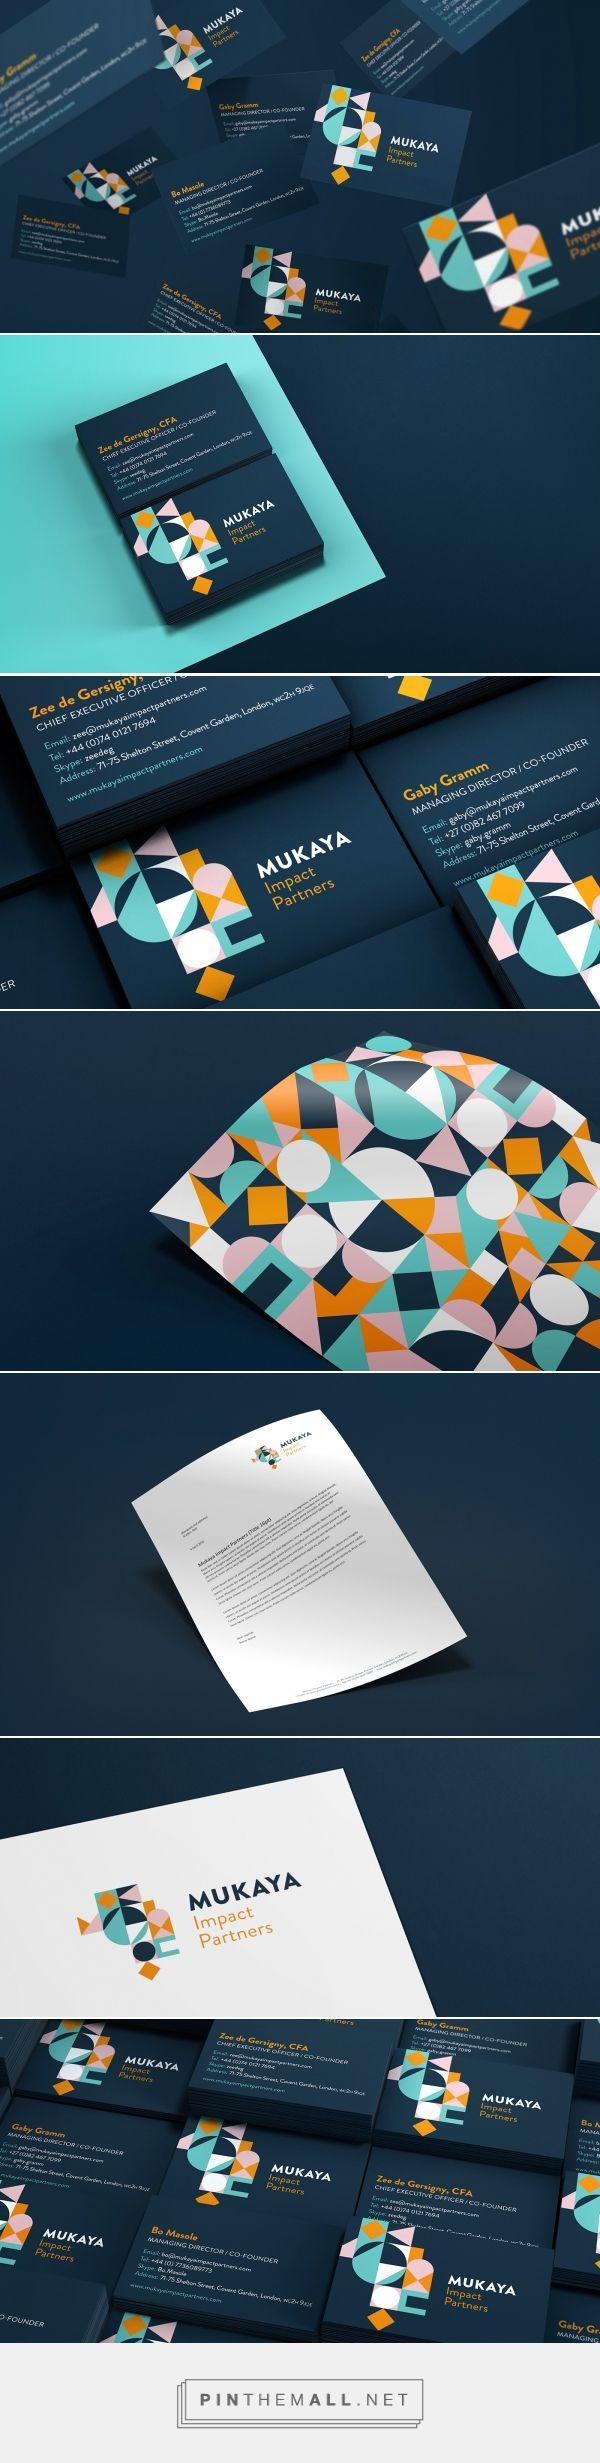 MUKAYA Impact Partners on Behance | Fivestar Branding – Design and Branding Agency & Inspiration Gallery